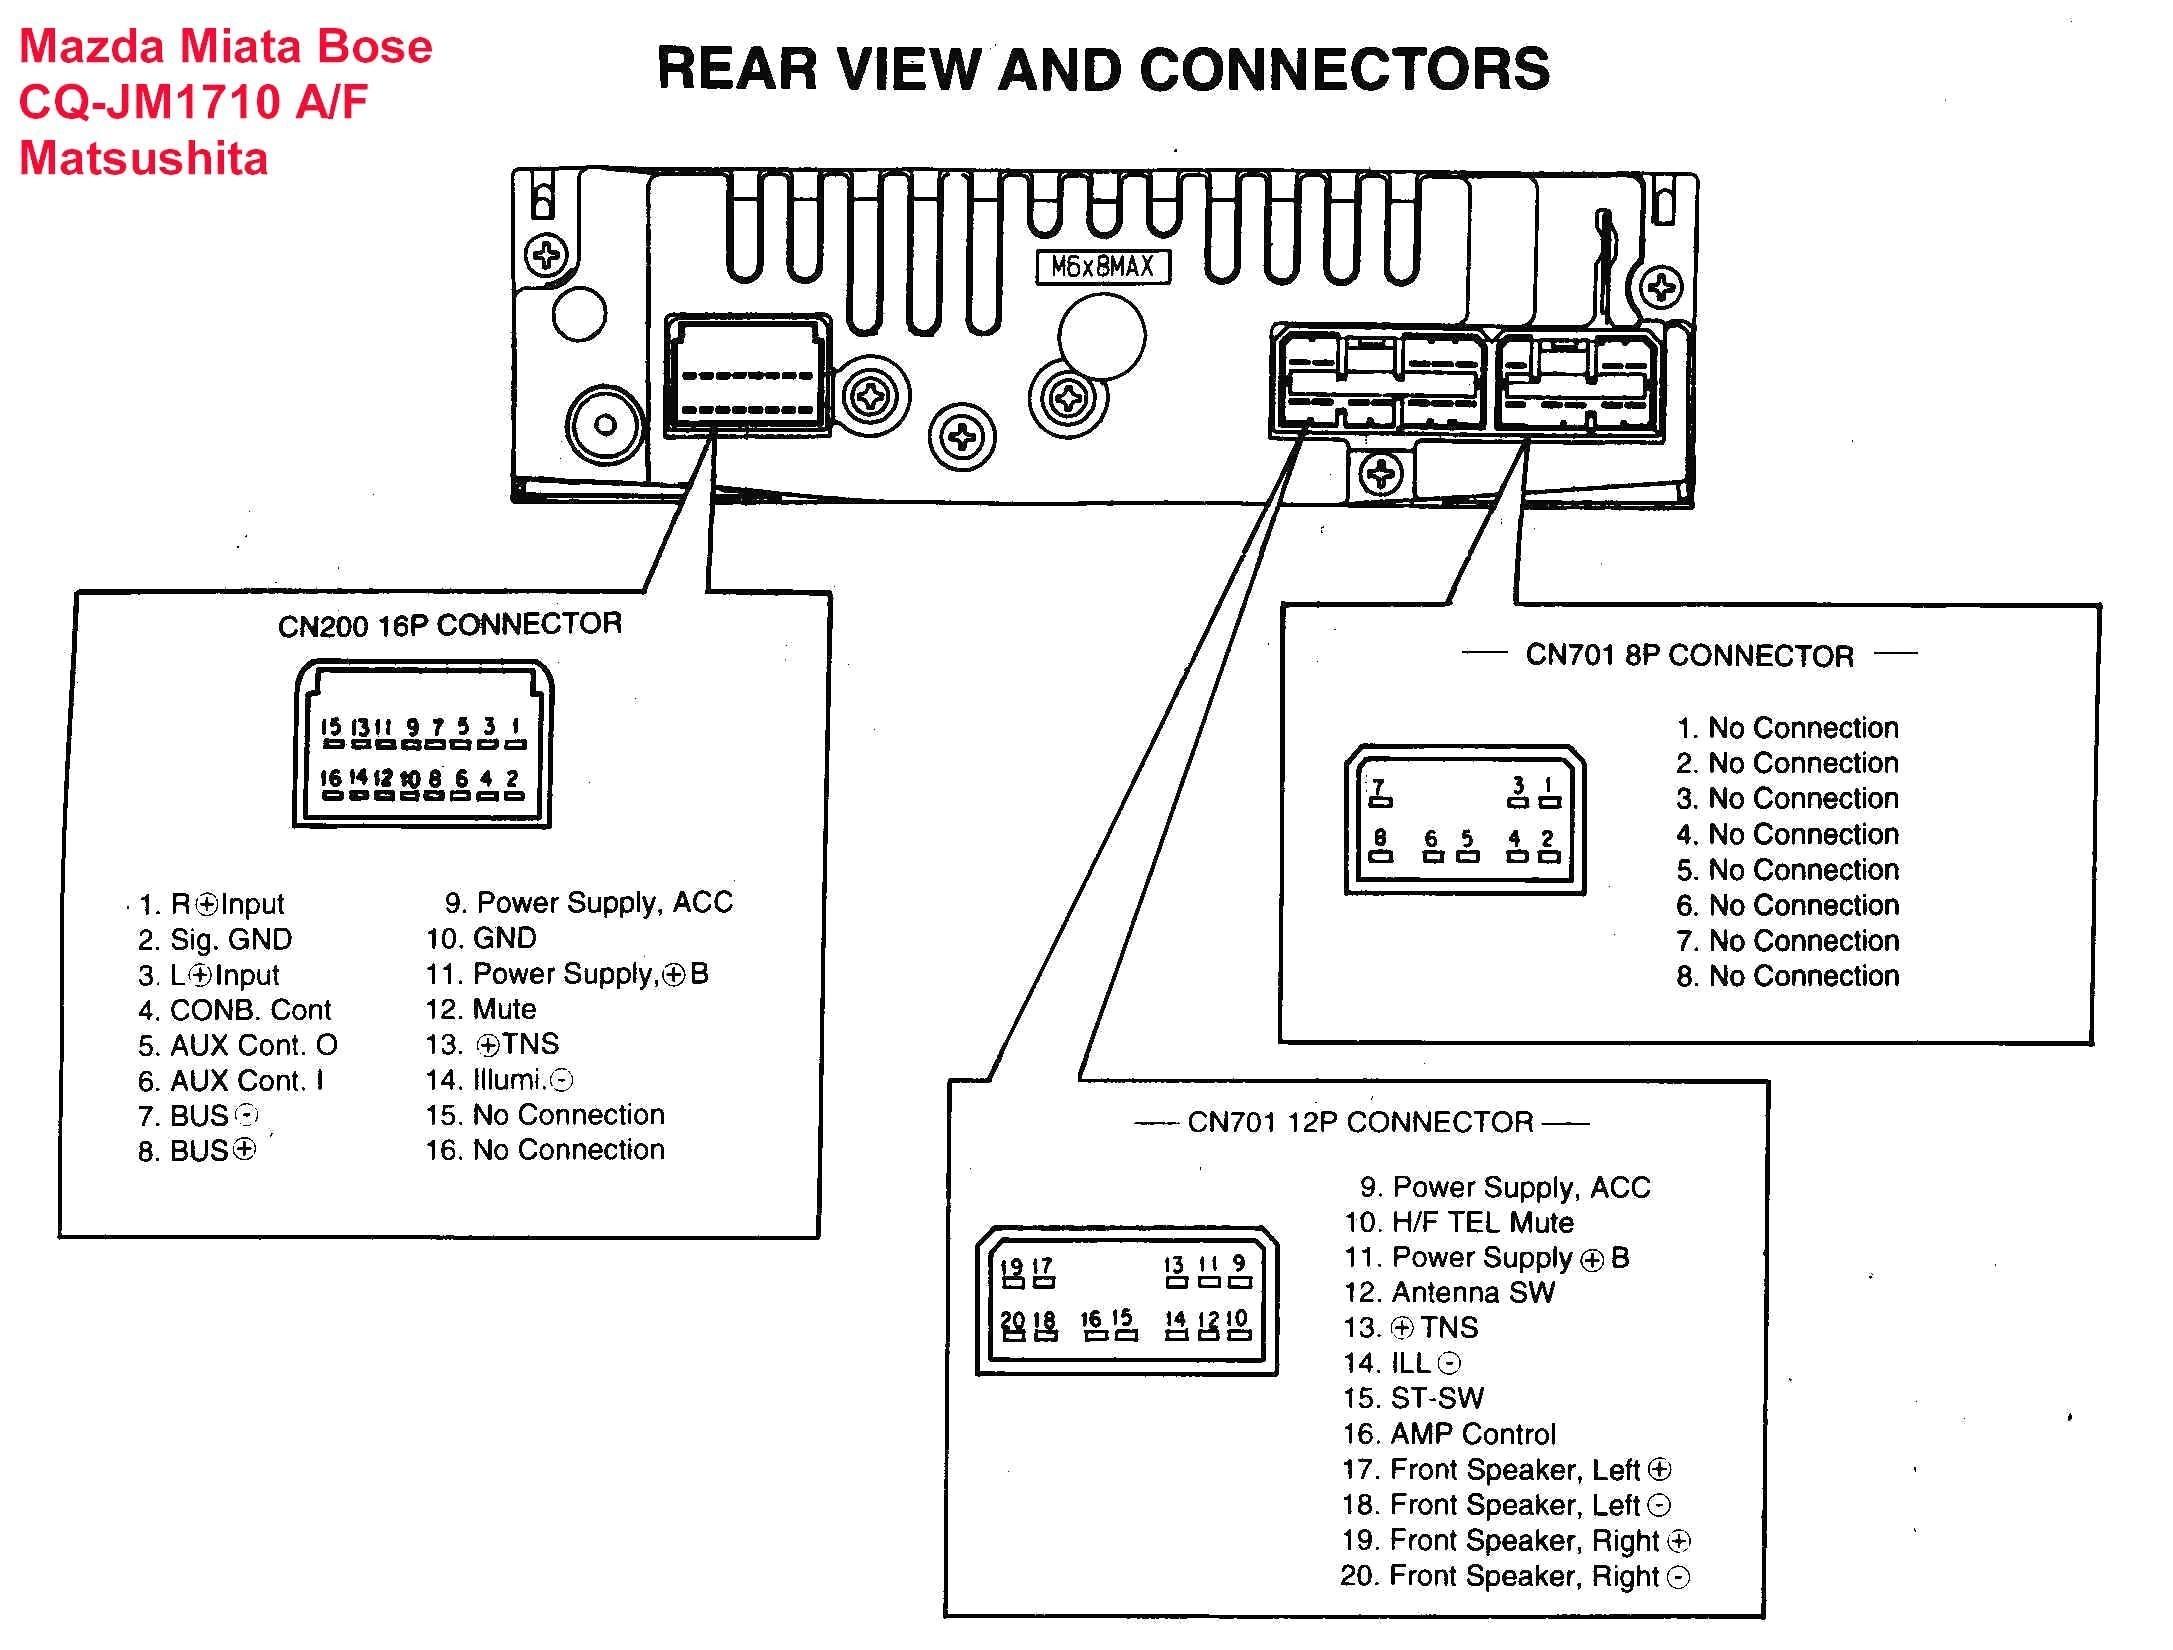 Panasonic Car Stereo Wiring Diagram sony Deck Wiring Diagram Wiring Schematics Diagram Of Panasonic Car Stereo Wiring Diagram